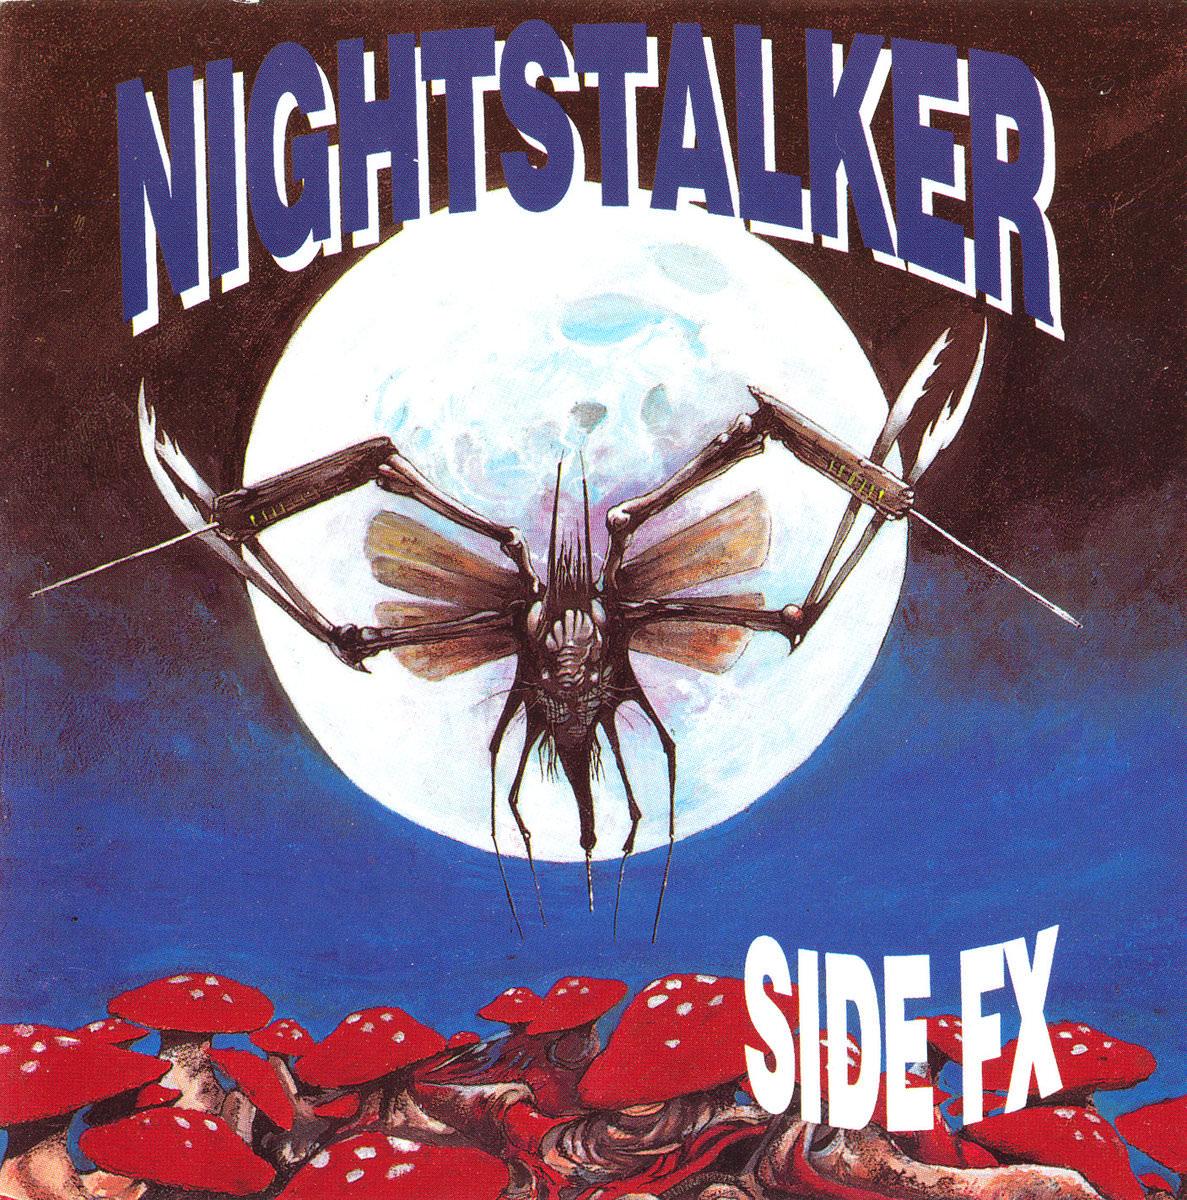 nightstalker-side-fx